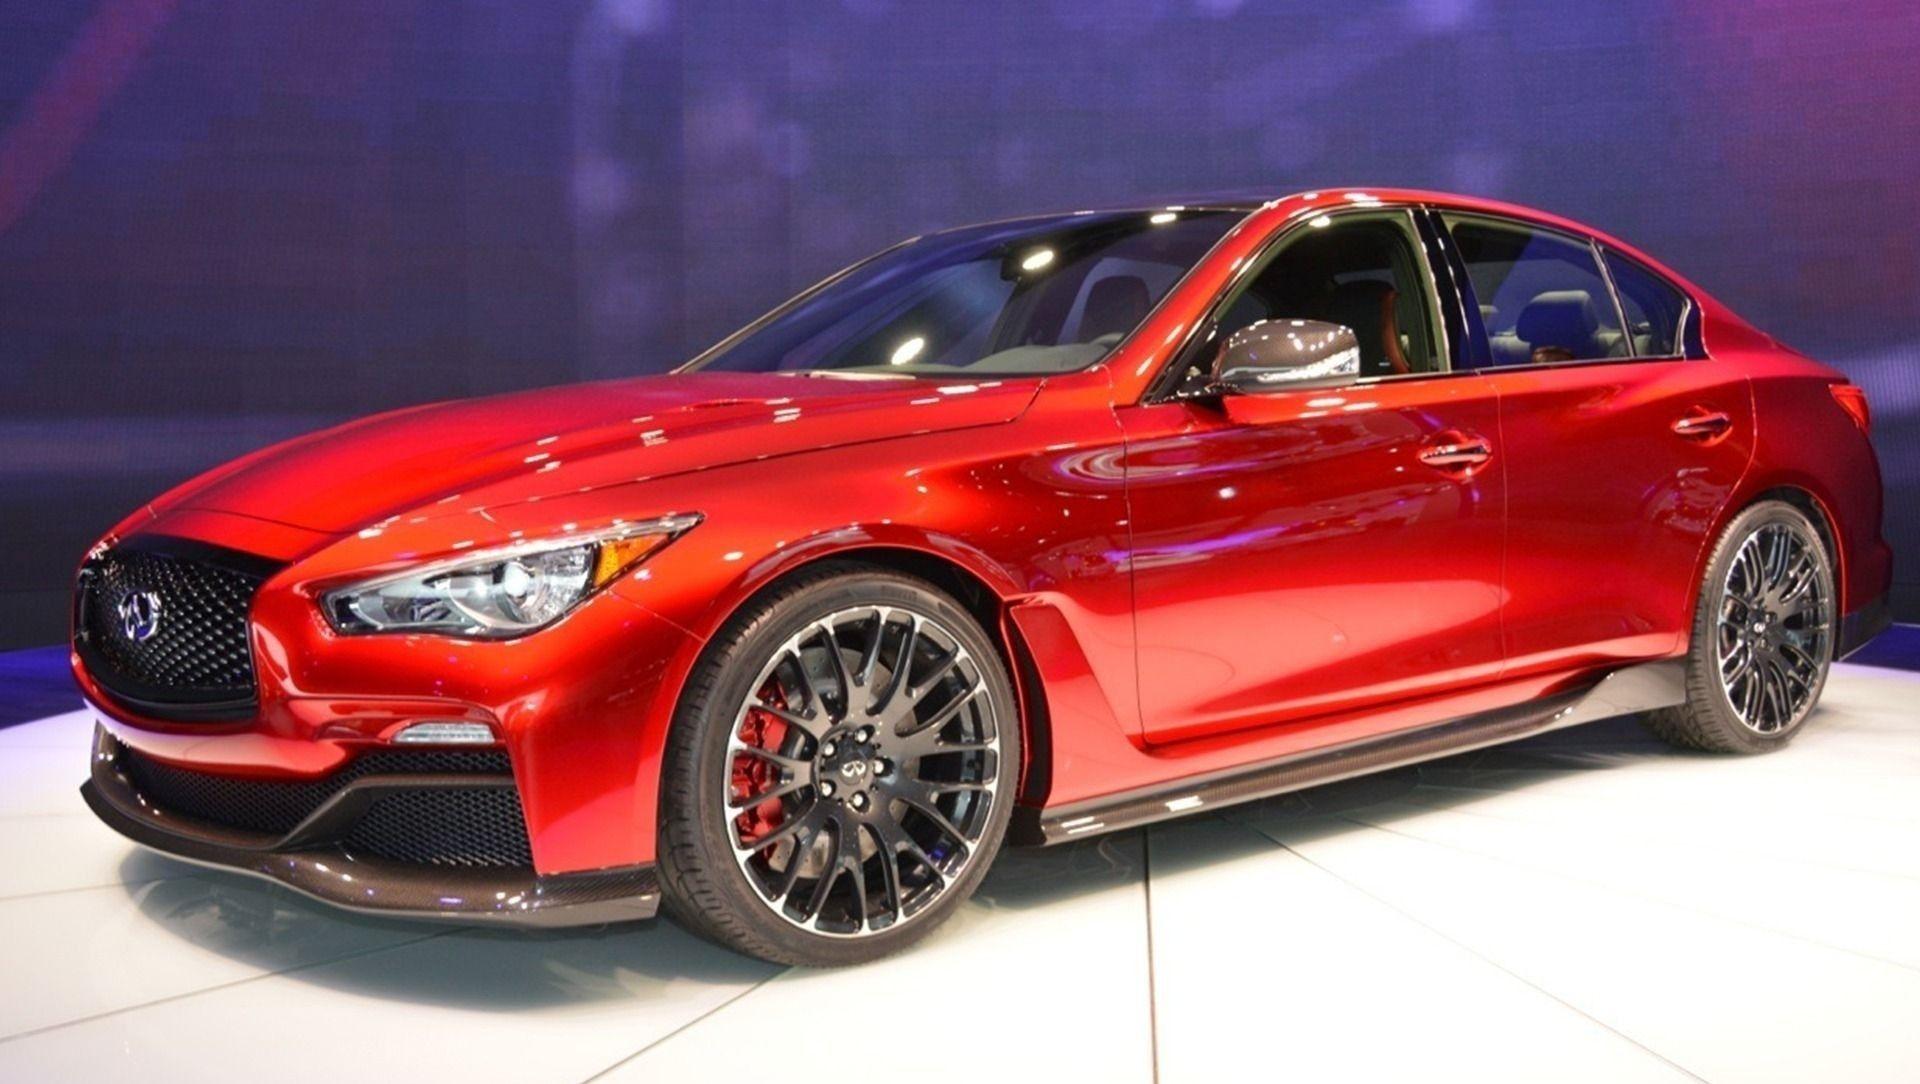 2019 Infiniti Q50 Coupe Eau Rouge Exterior Infiniti q50